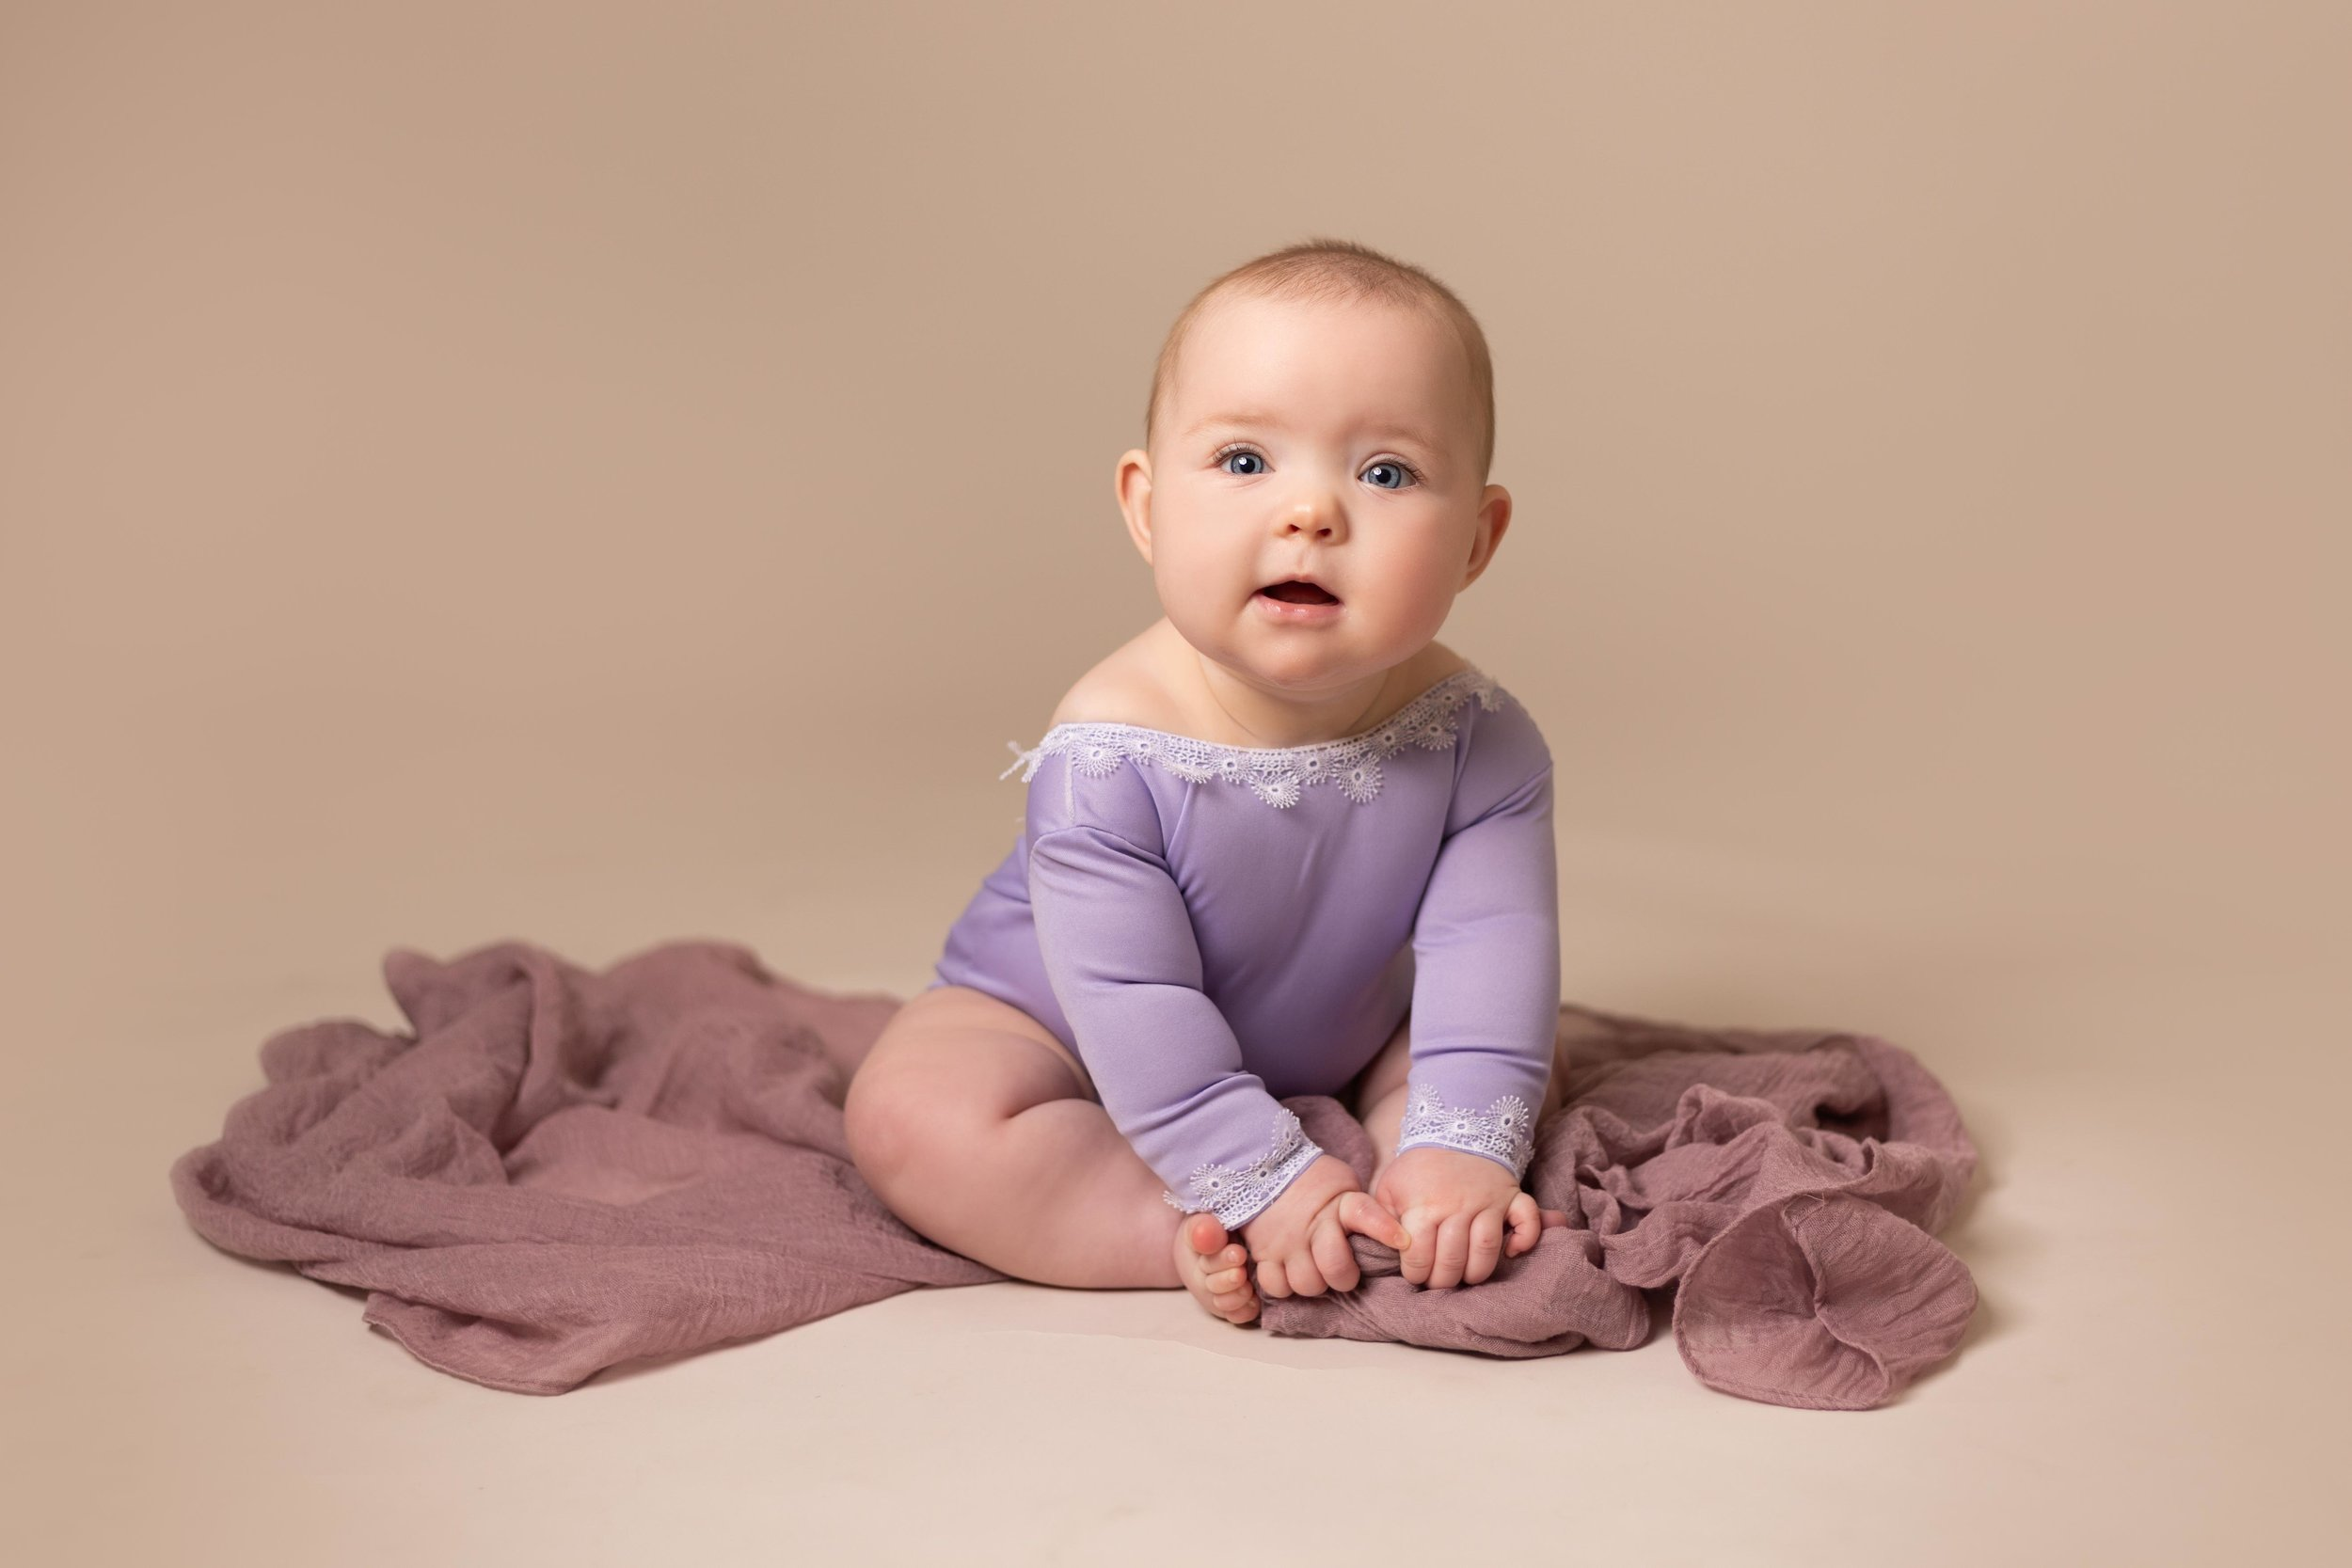 LEA-COOPER-PHOTOGRAPHY-CHILD-PHOTOGRAPHY-WILLENHALL-CHILDREN-PHOTOGRAPHER-WOLVERHAMPTON-BILSTON-WEDNESBURY-KIDS-PHOTOGRAPHER-SITTER-SESSION-MILESTONE--17.JPG